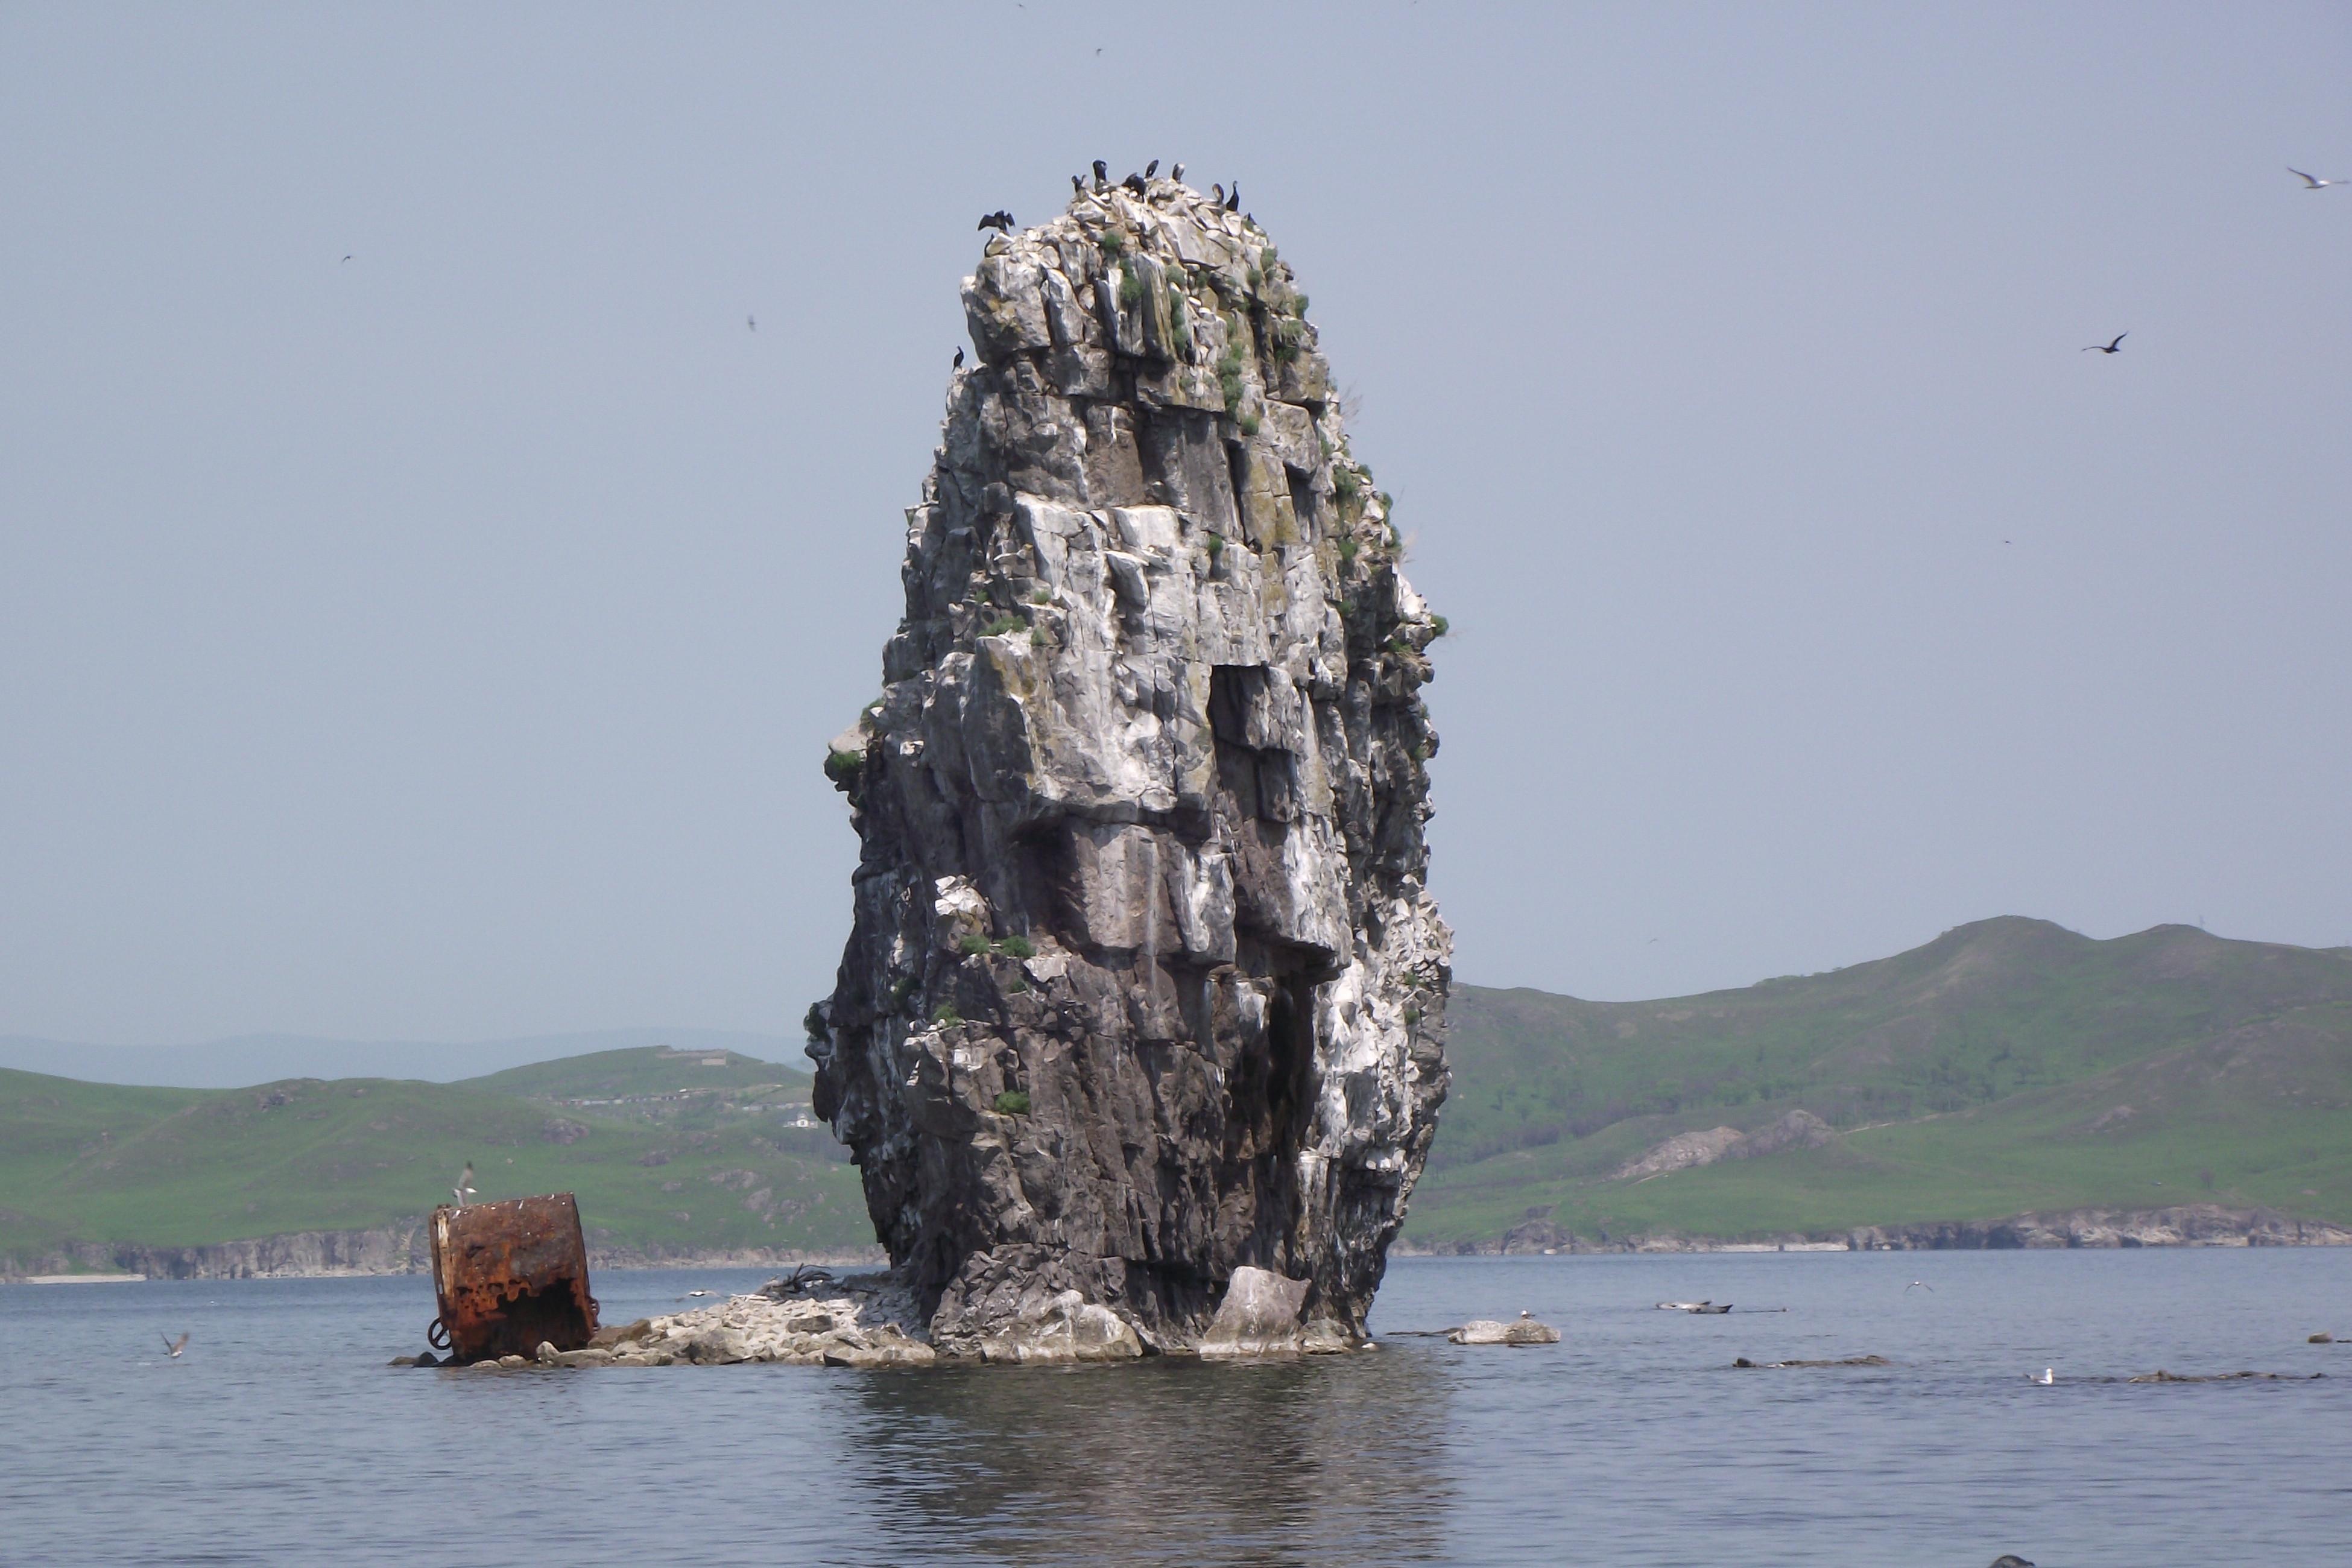 Две жемчужины залива Петра Великого